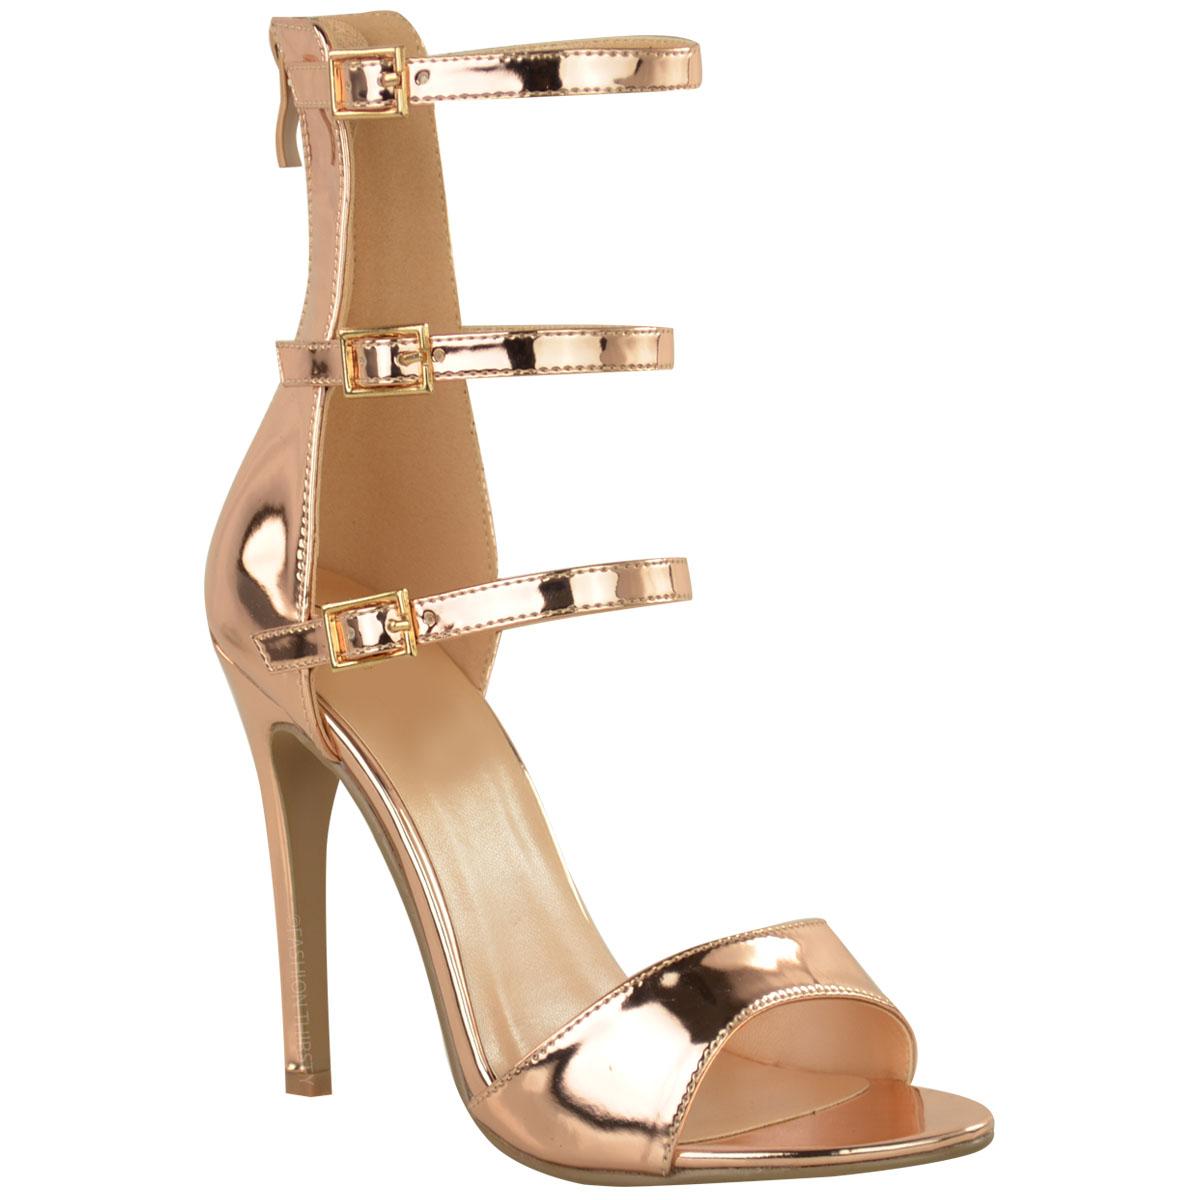 Teen Ladies Size Ebay Shoes 118